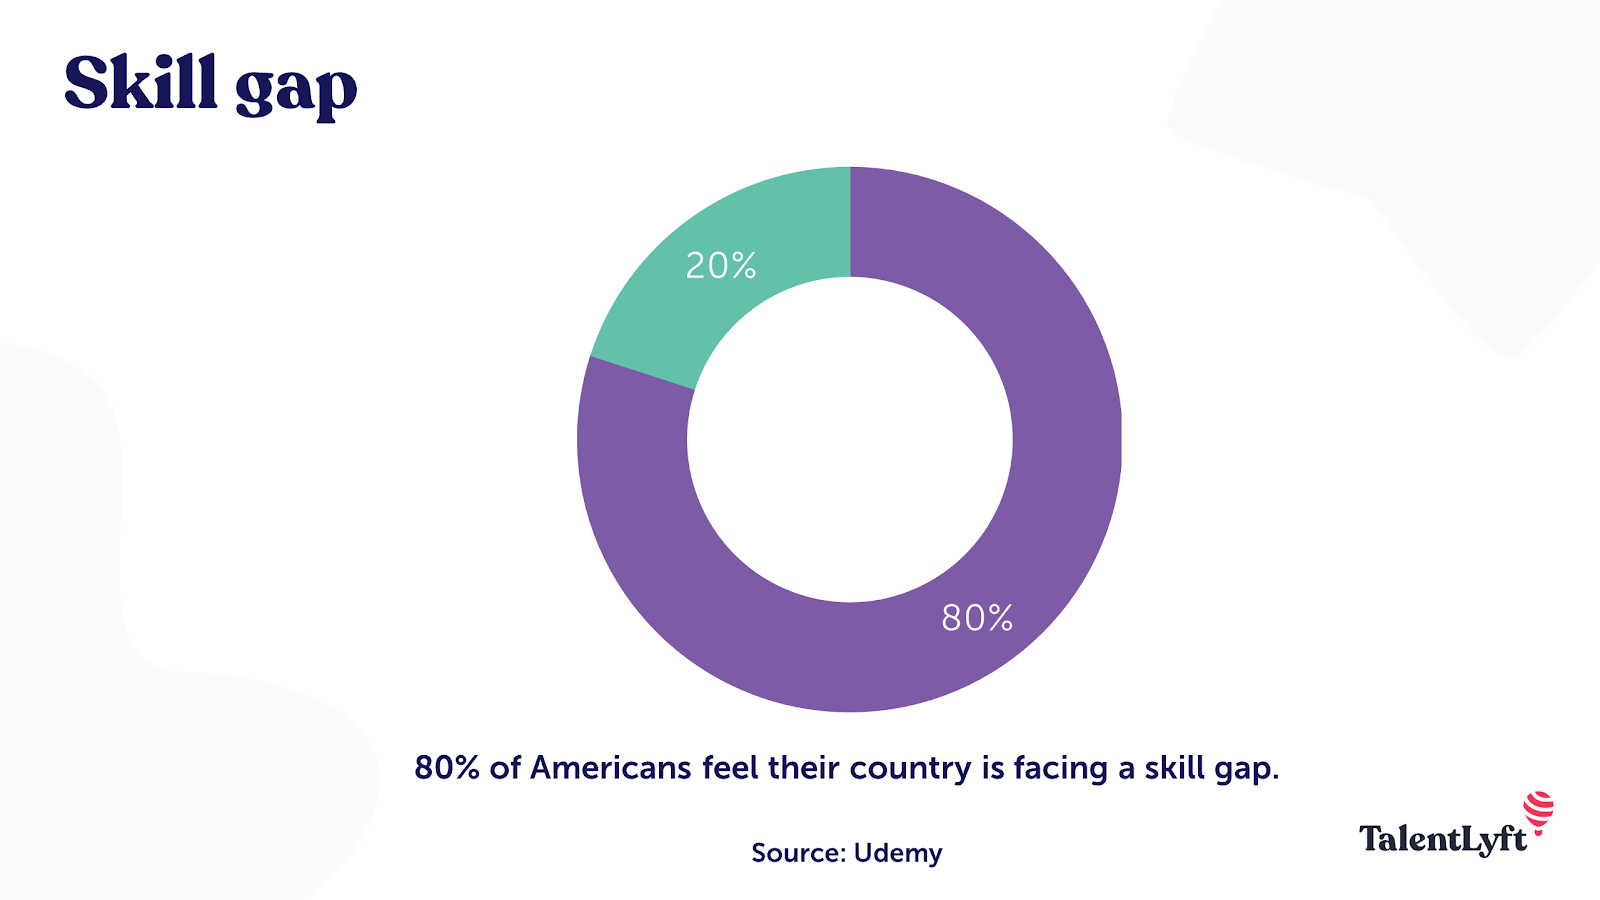 Skill gap statistic